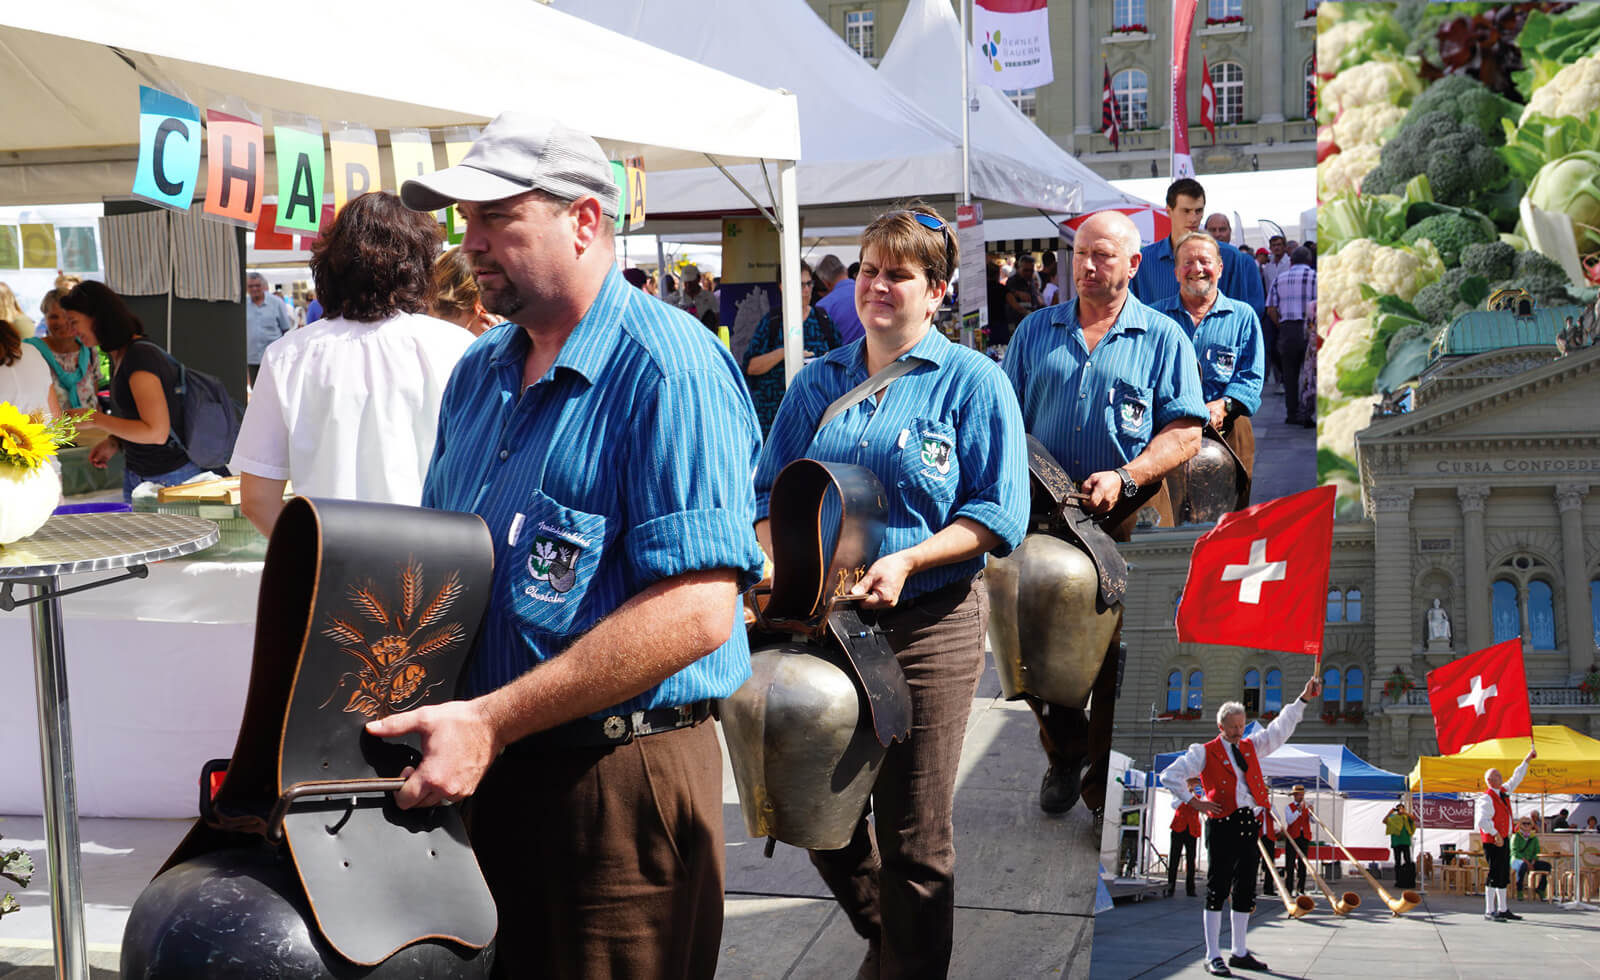 Sichlete Festival Bern